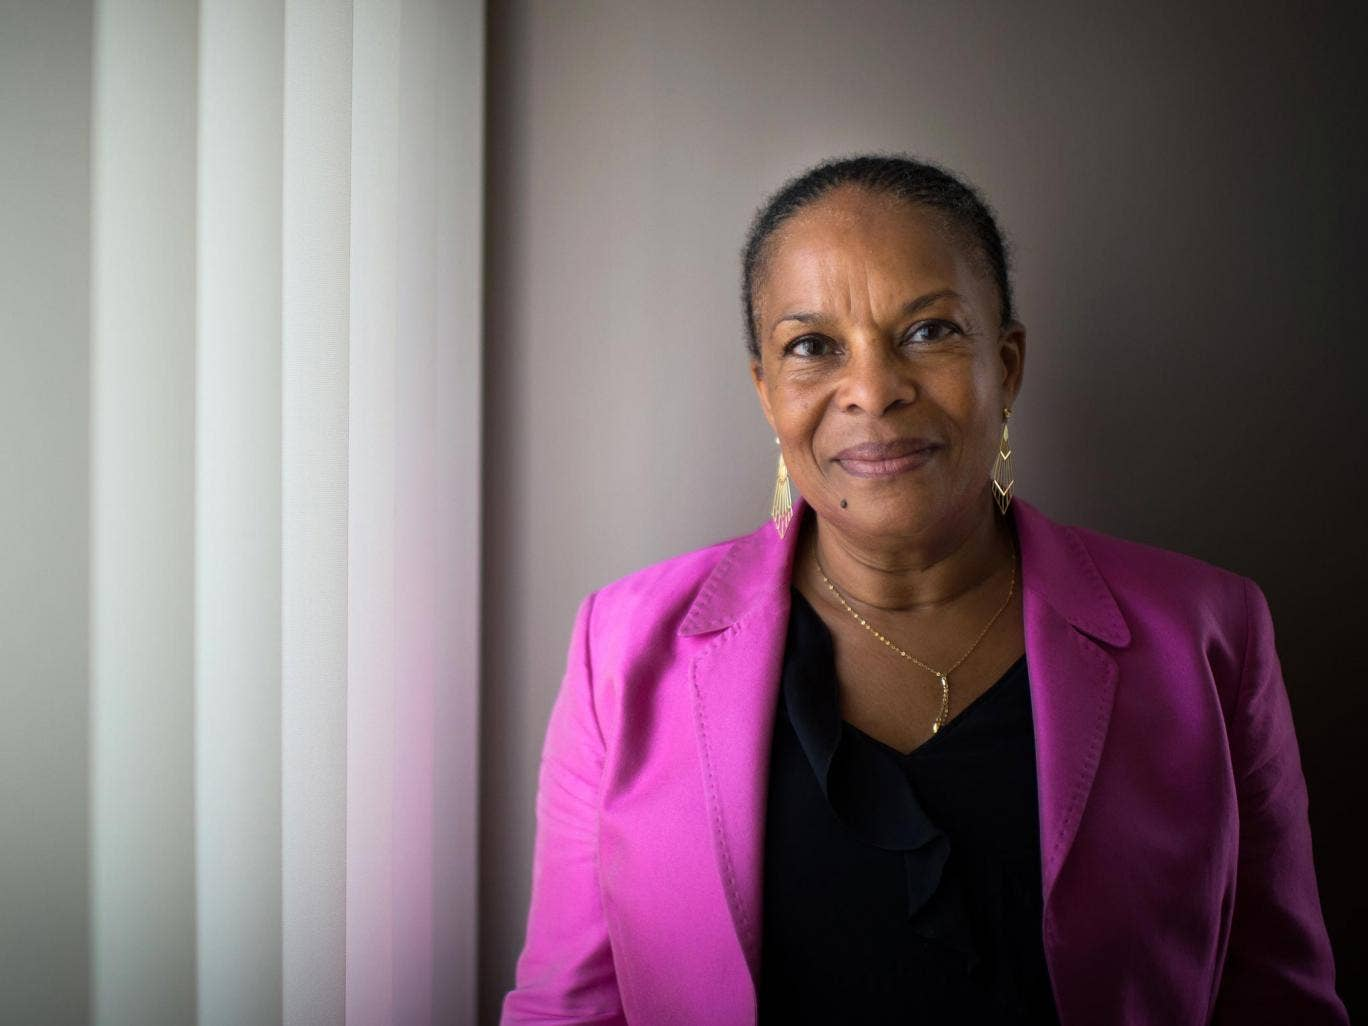 Christiane Taubira helped push through France's gay marriage bill